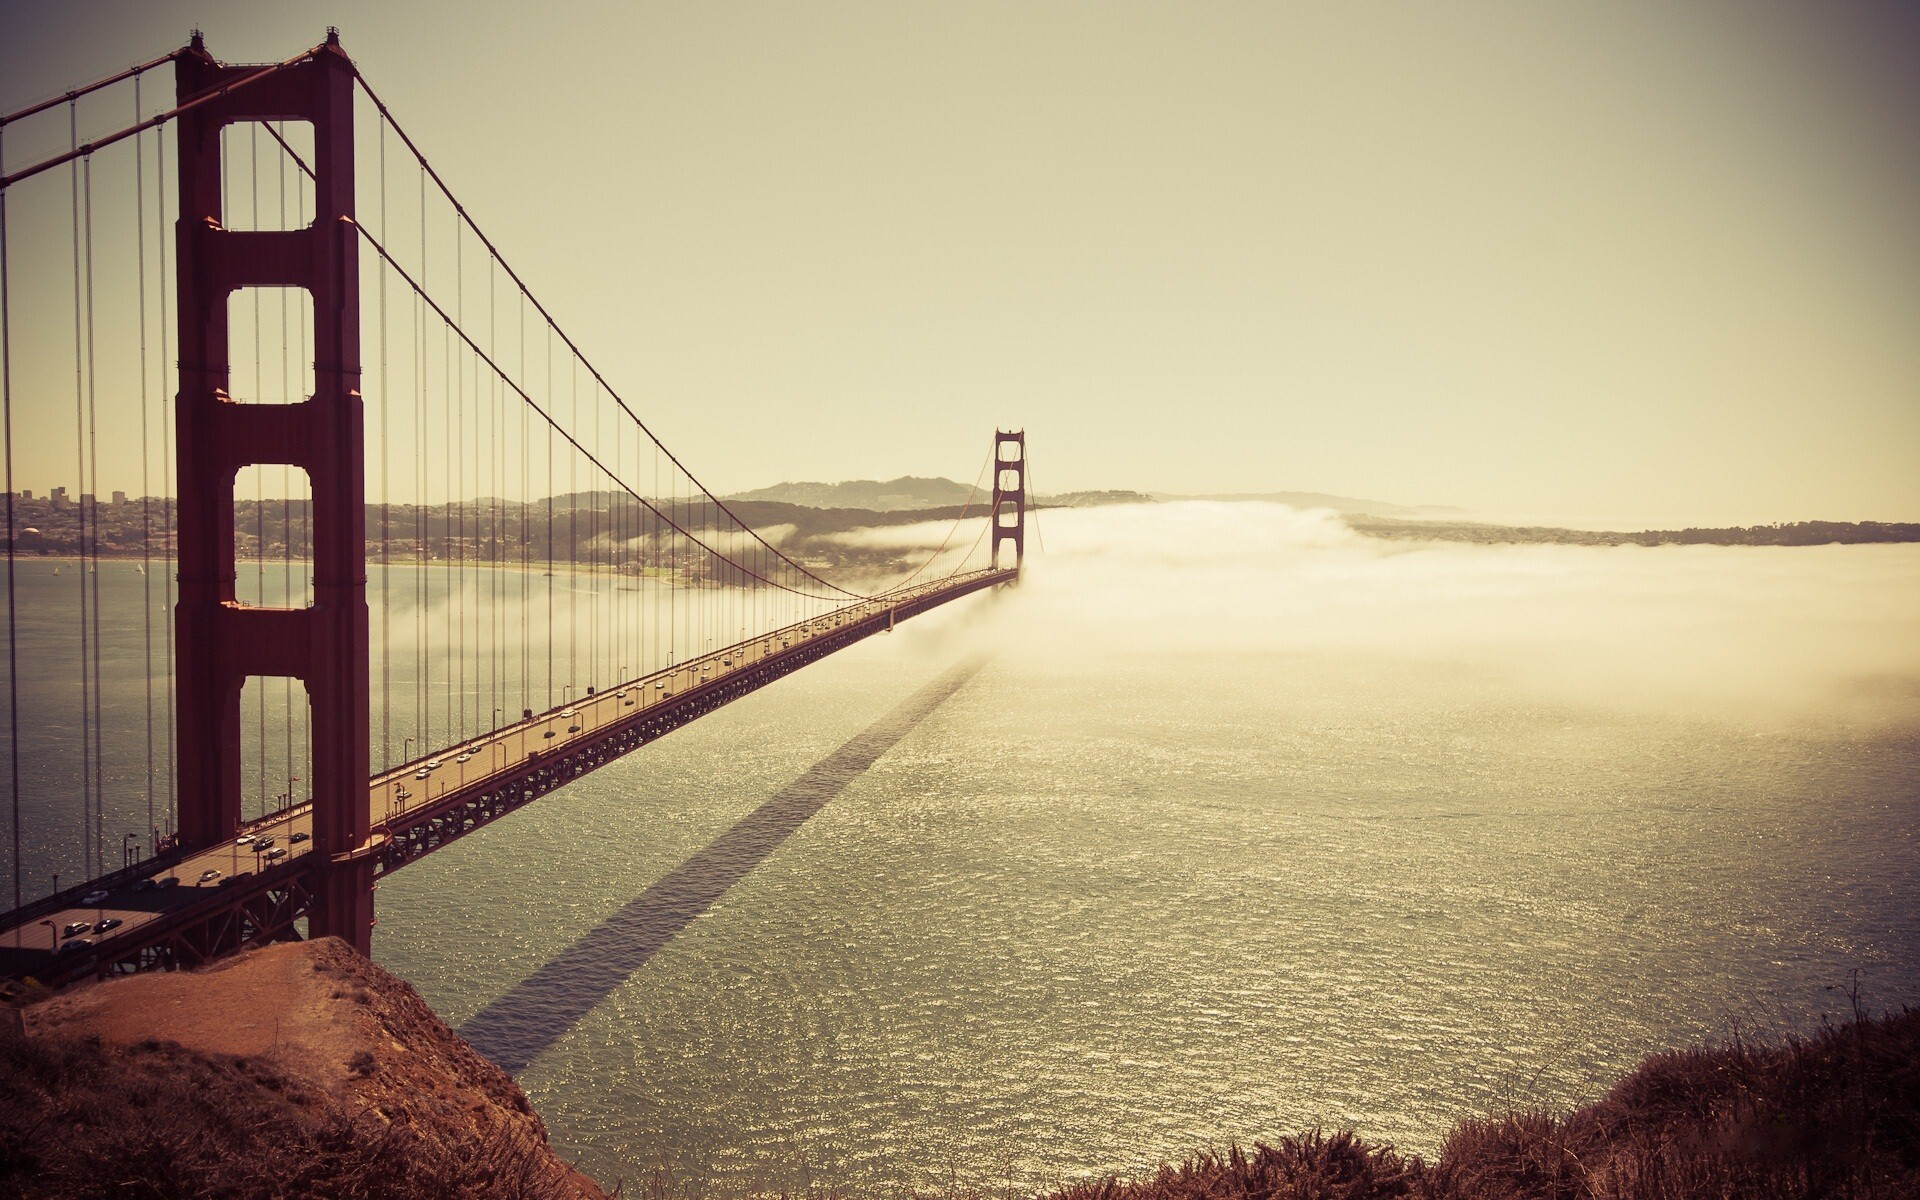 Big Golden Gate Bridge Wallpapers | HD